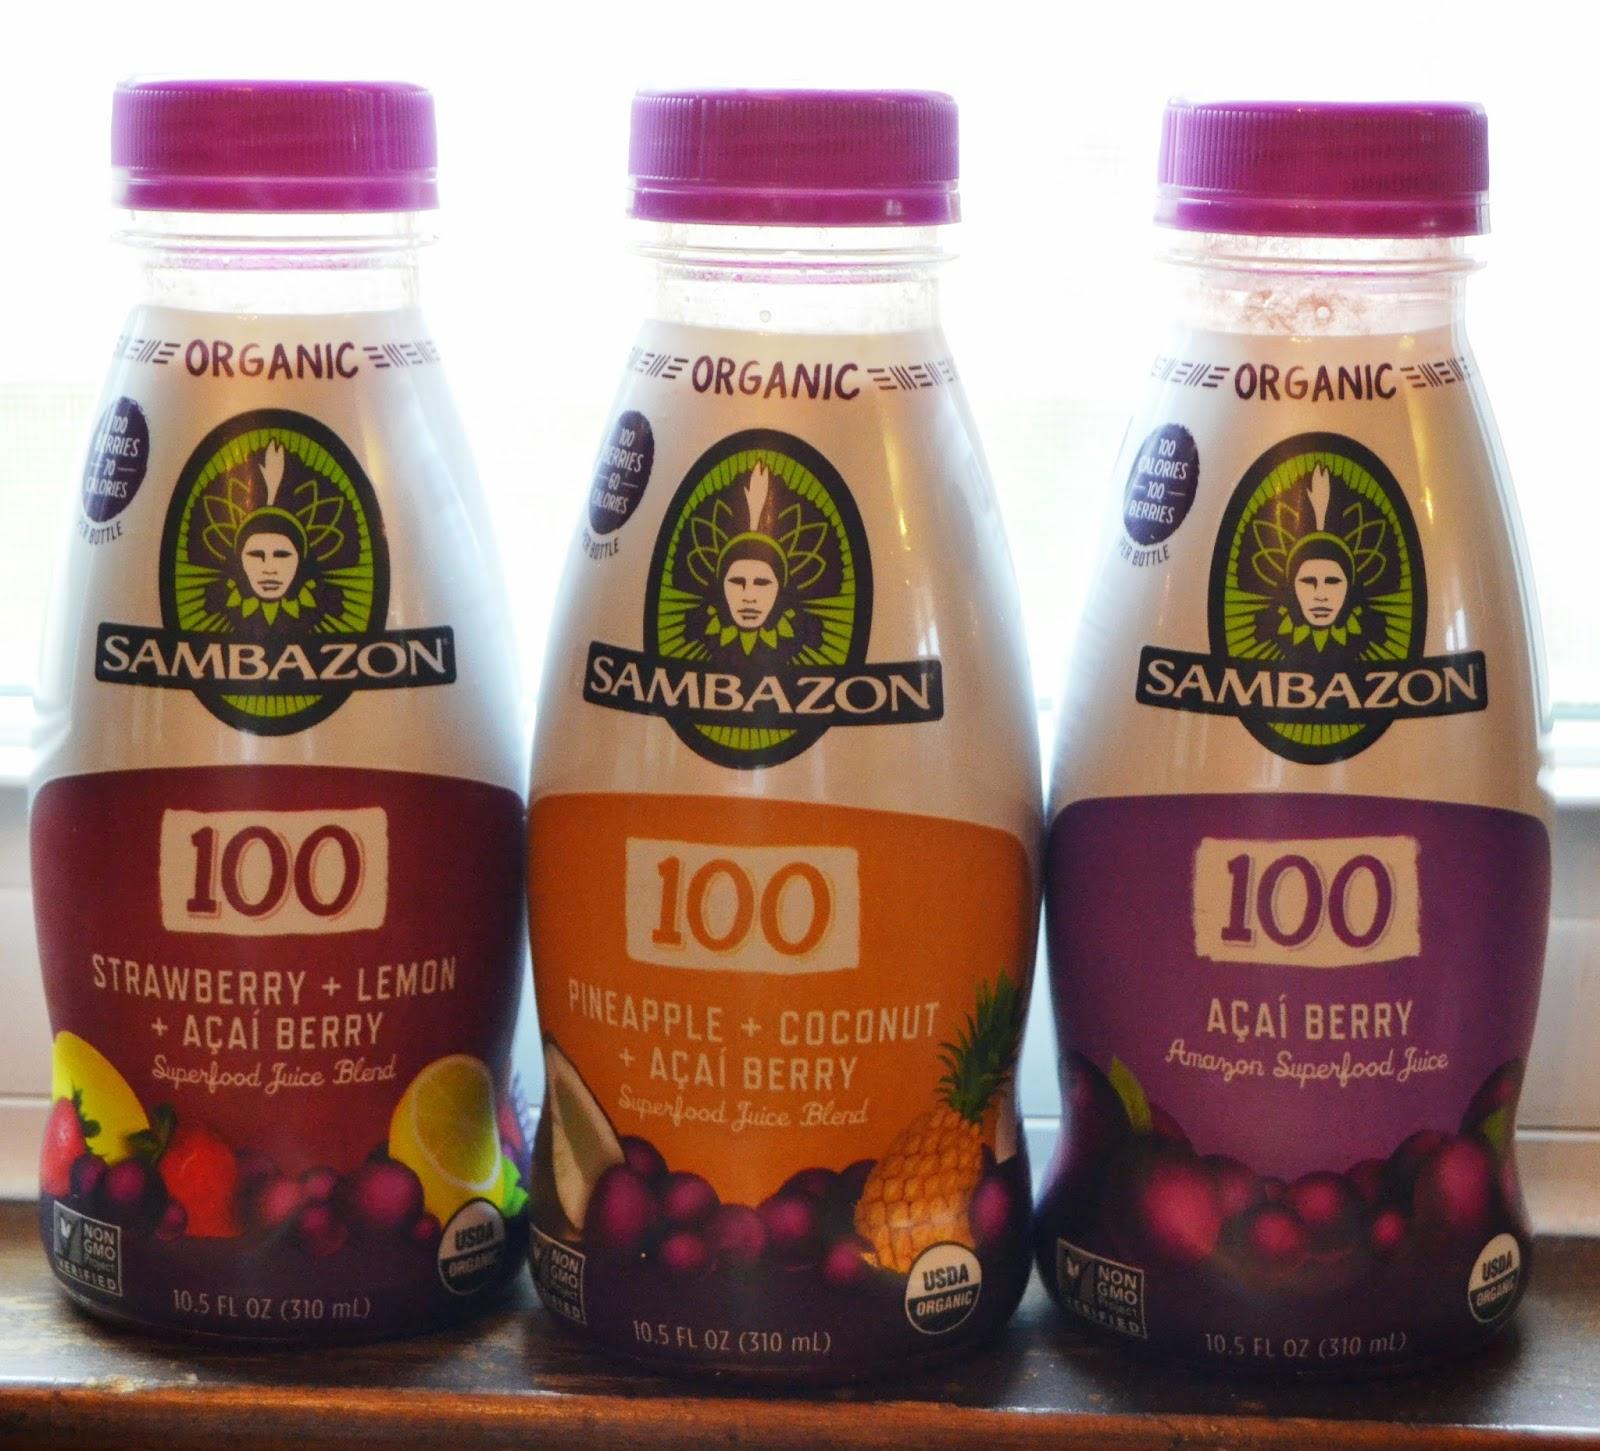 Sambazon 100 Juice